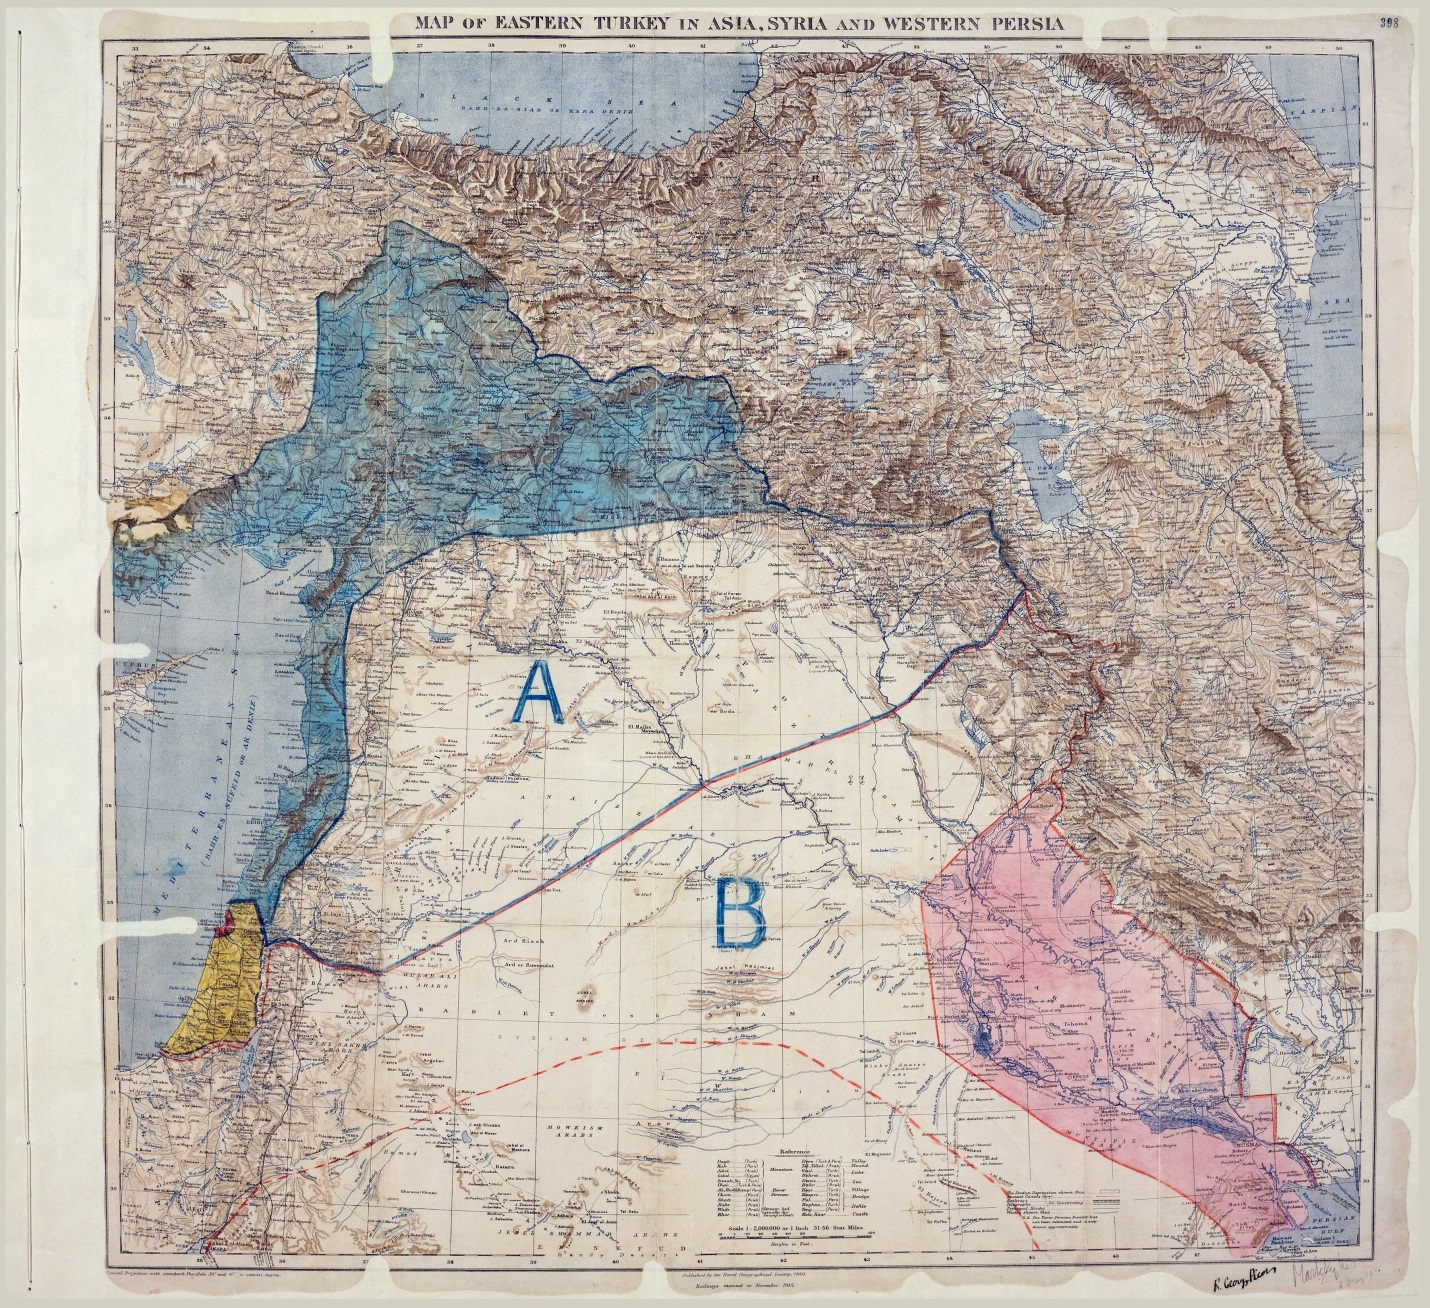 Original Sykes-Picot map